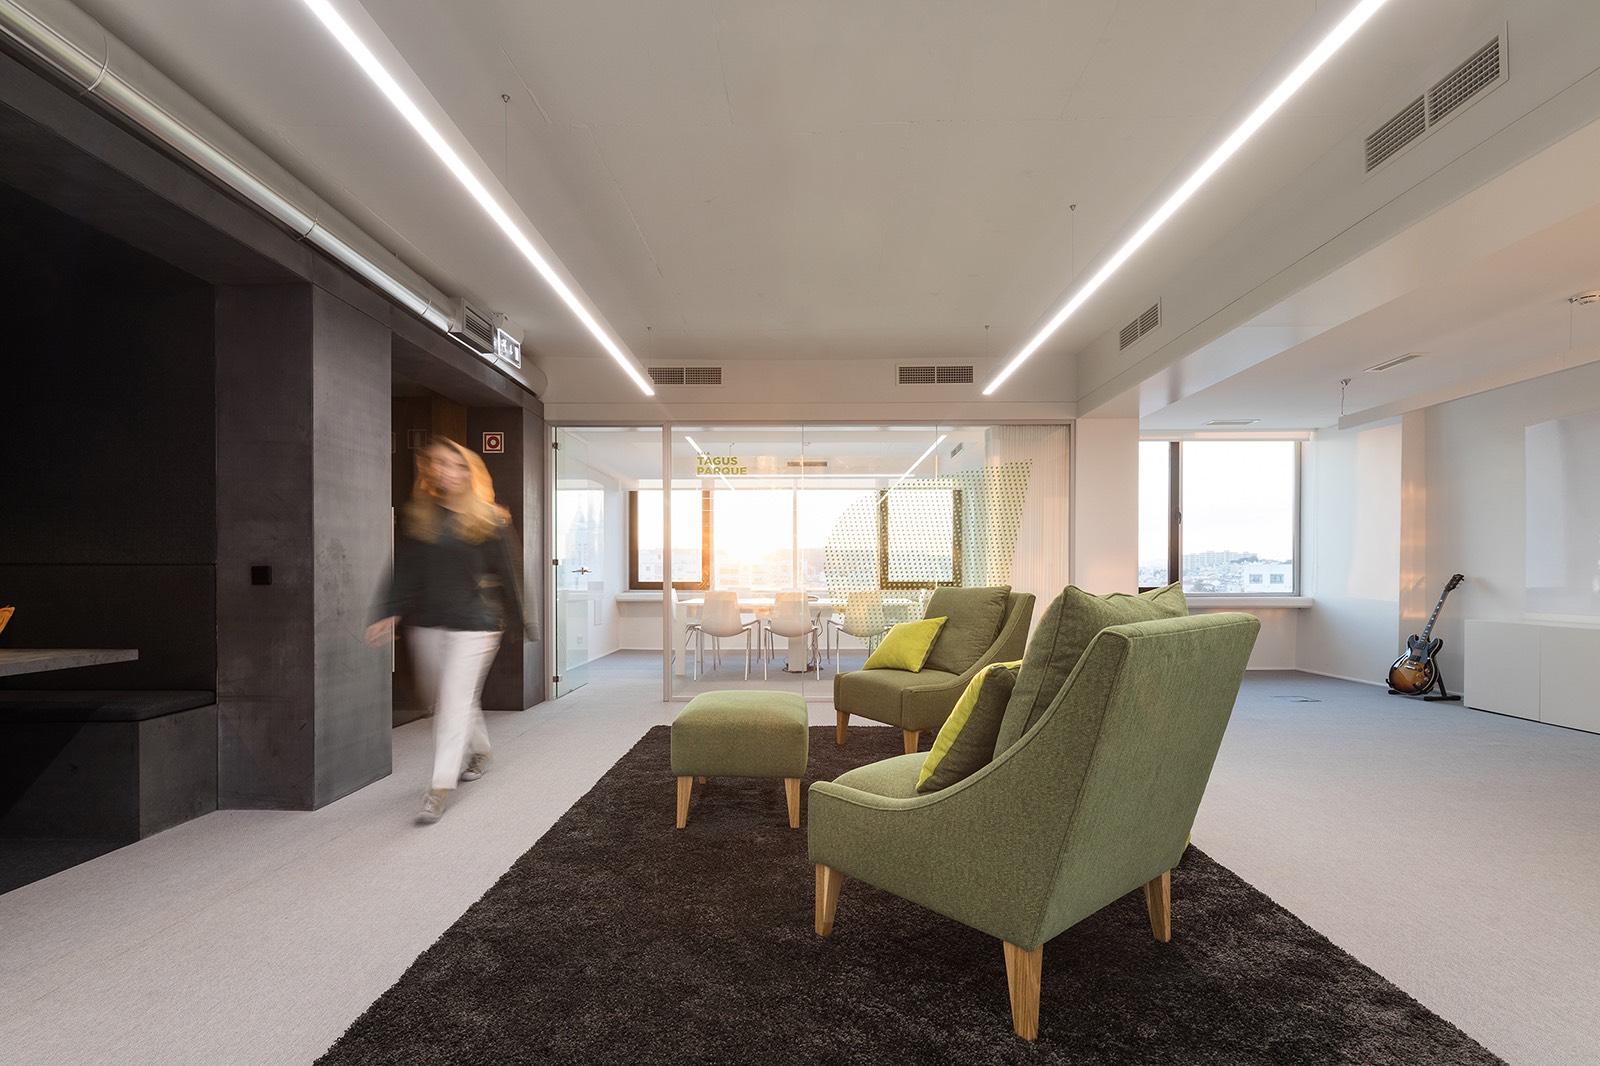 seedrs-office-lisbon-14